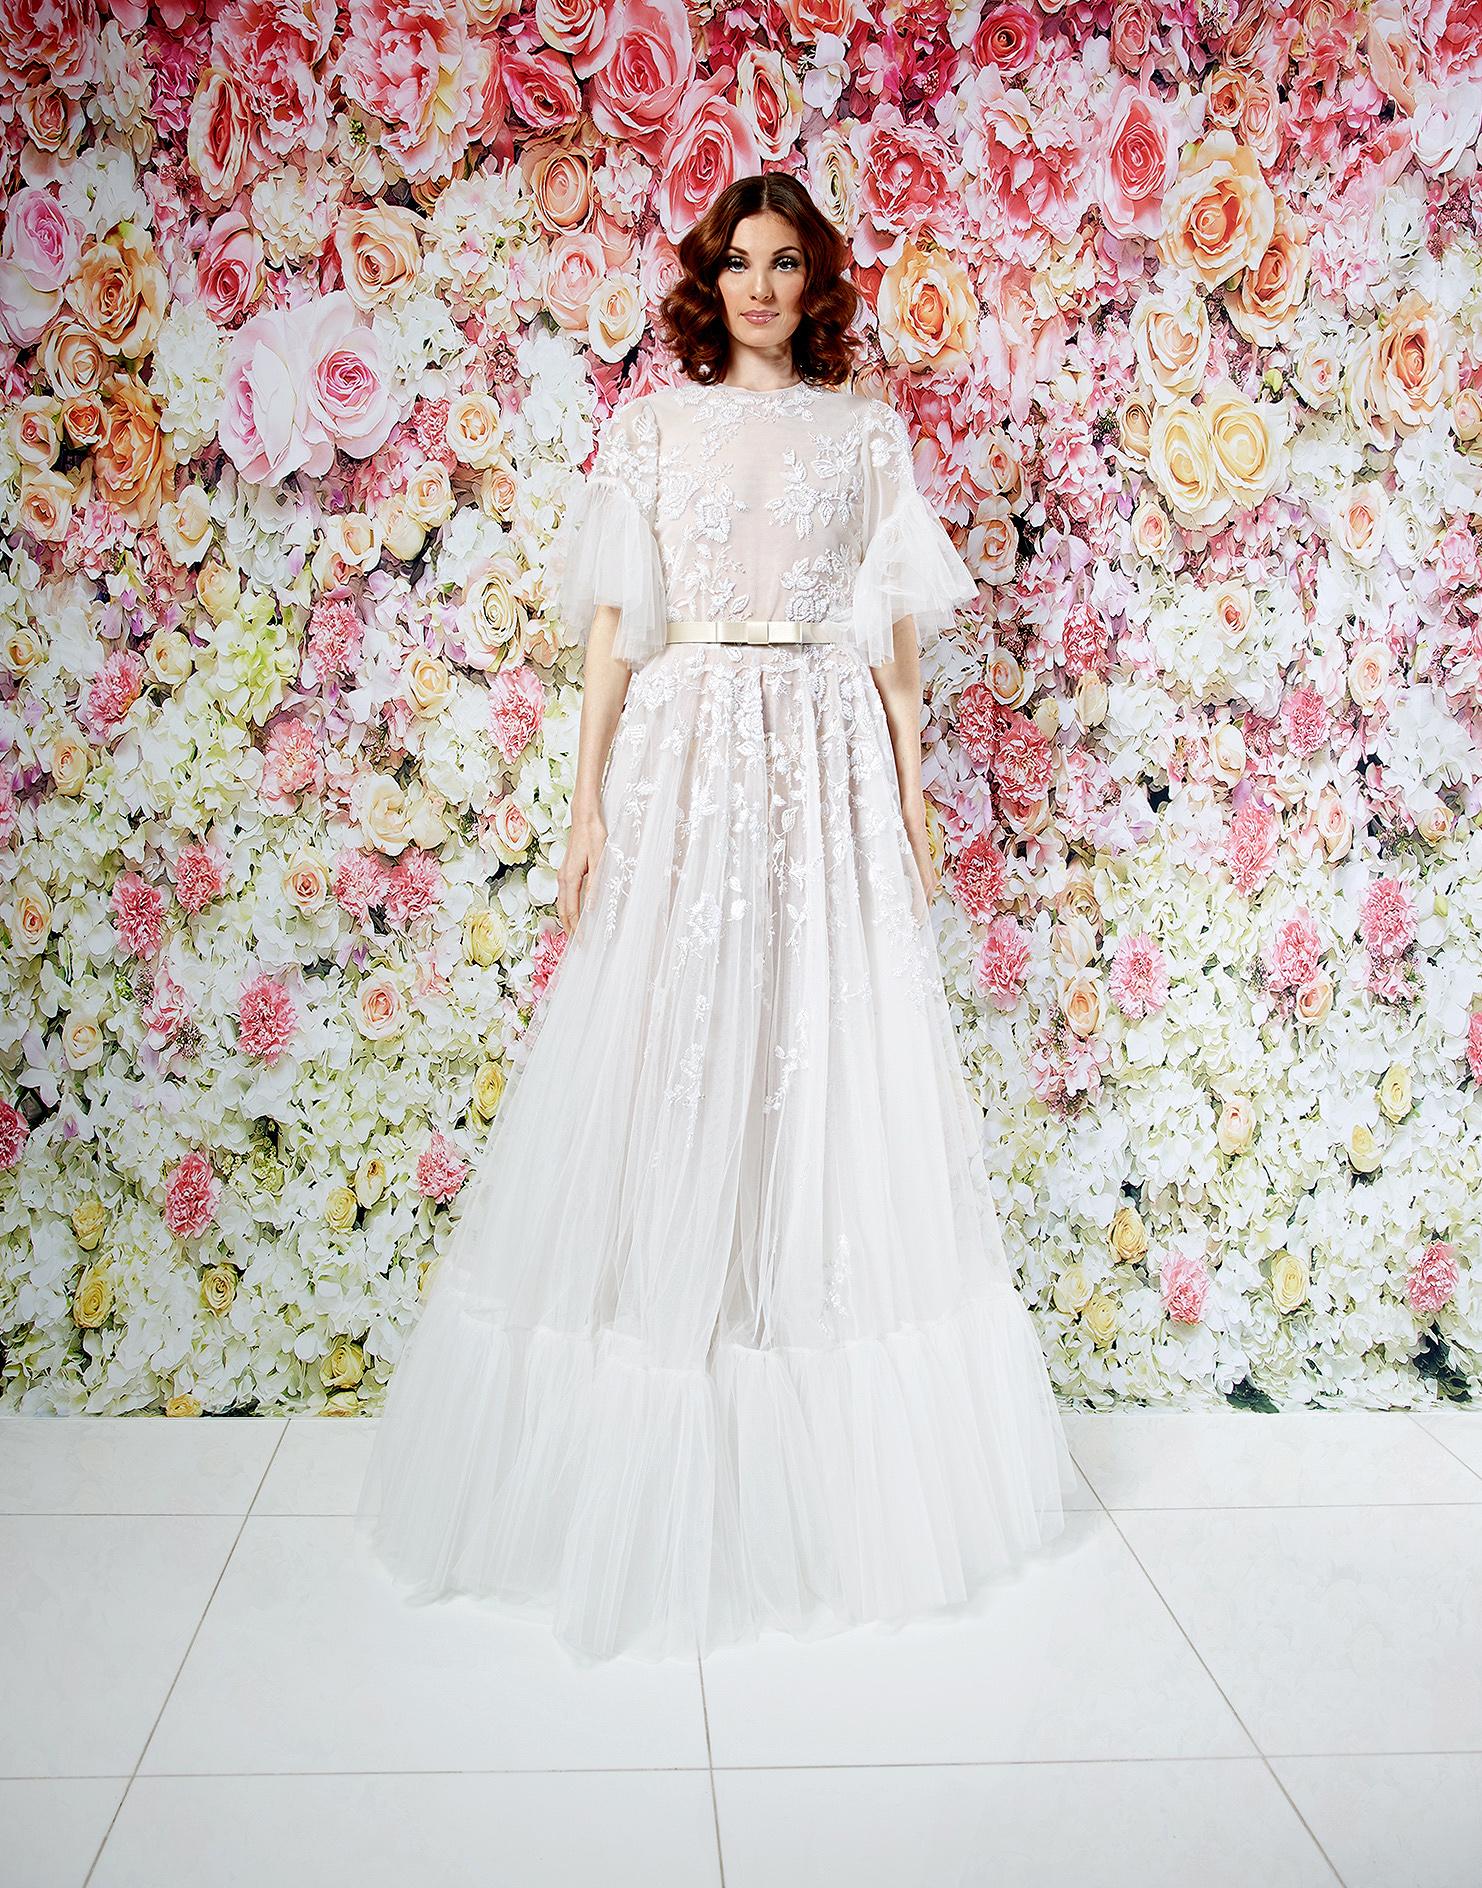 randi rahm wedding dress spring 2019 boho high-neck flutter sleeves